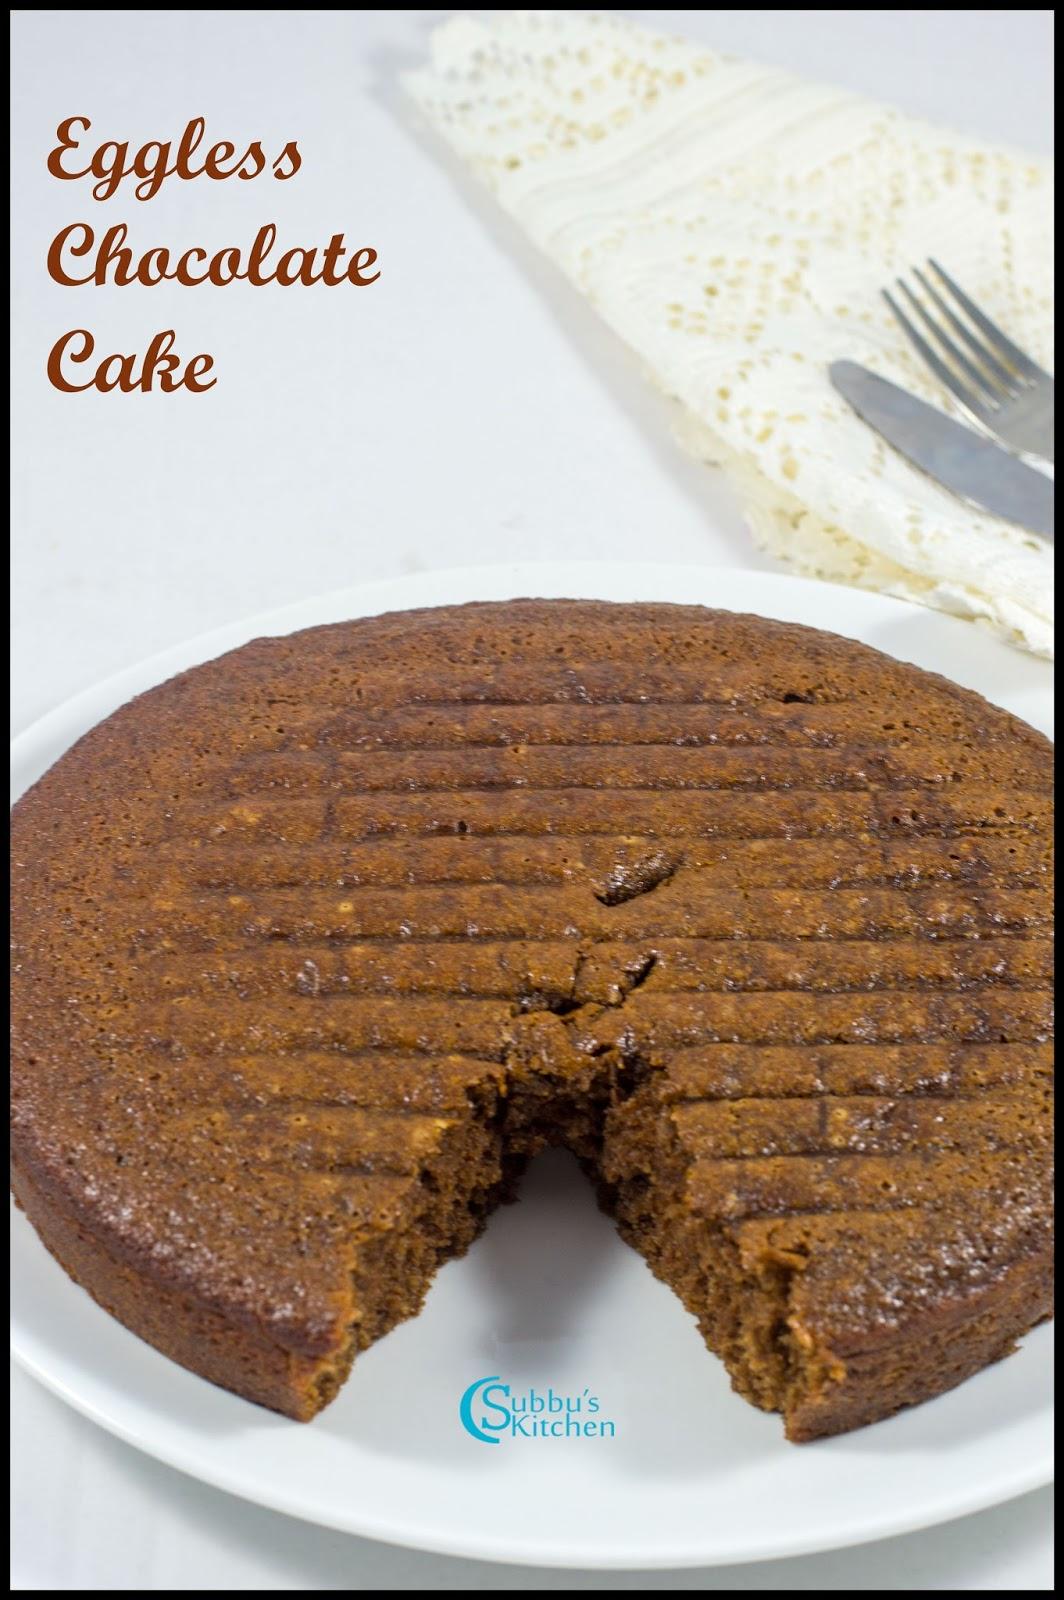 Eggless Chocolate Cake Recipe | Subbus Kitchen